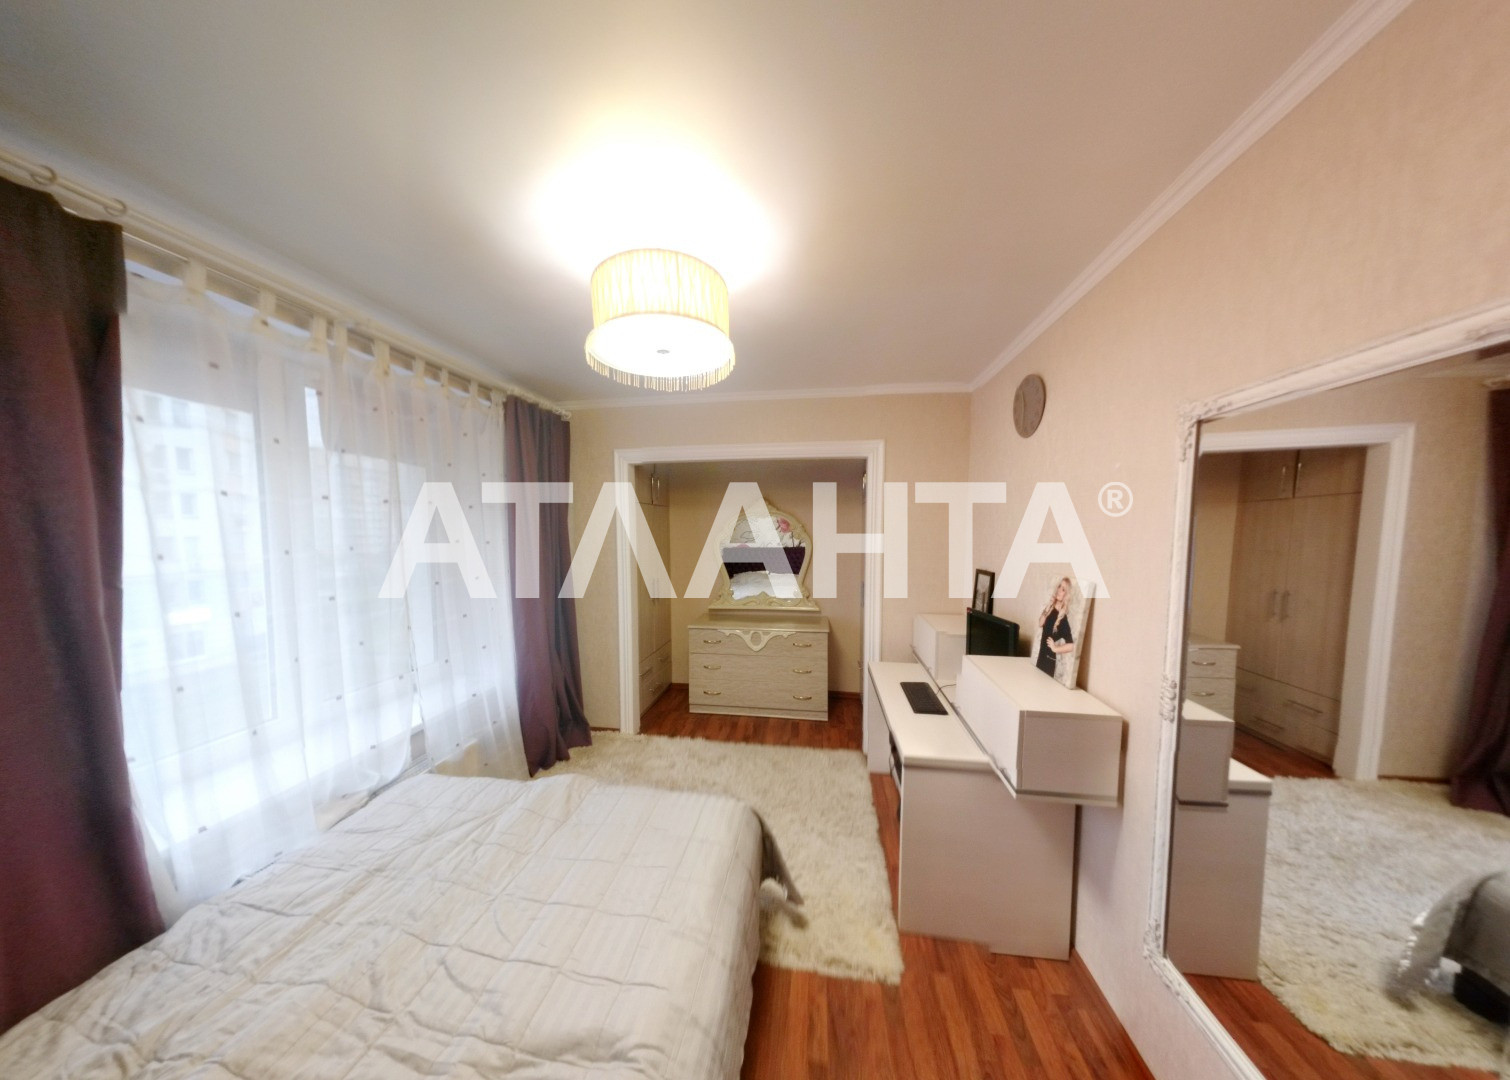 Продается 3-комнатная Квартира на ул. Ул. Ломоносова — 139 600 у.е. (фото №14)